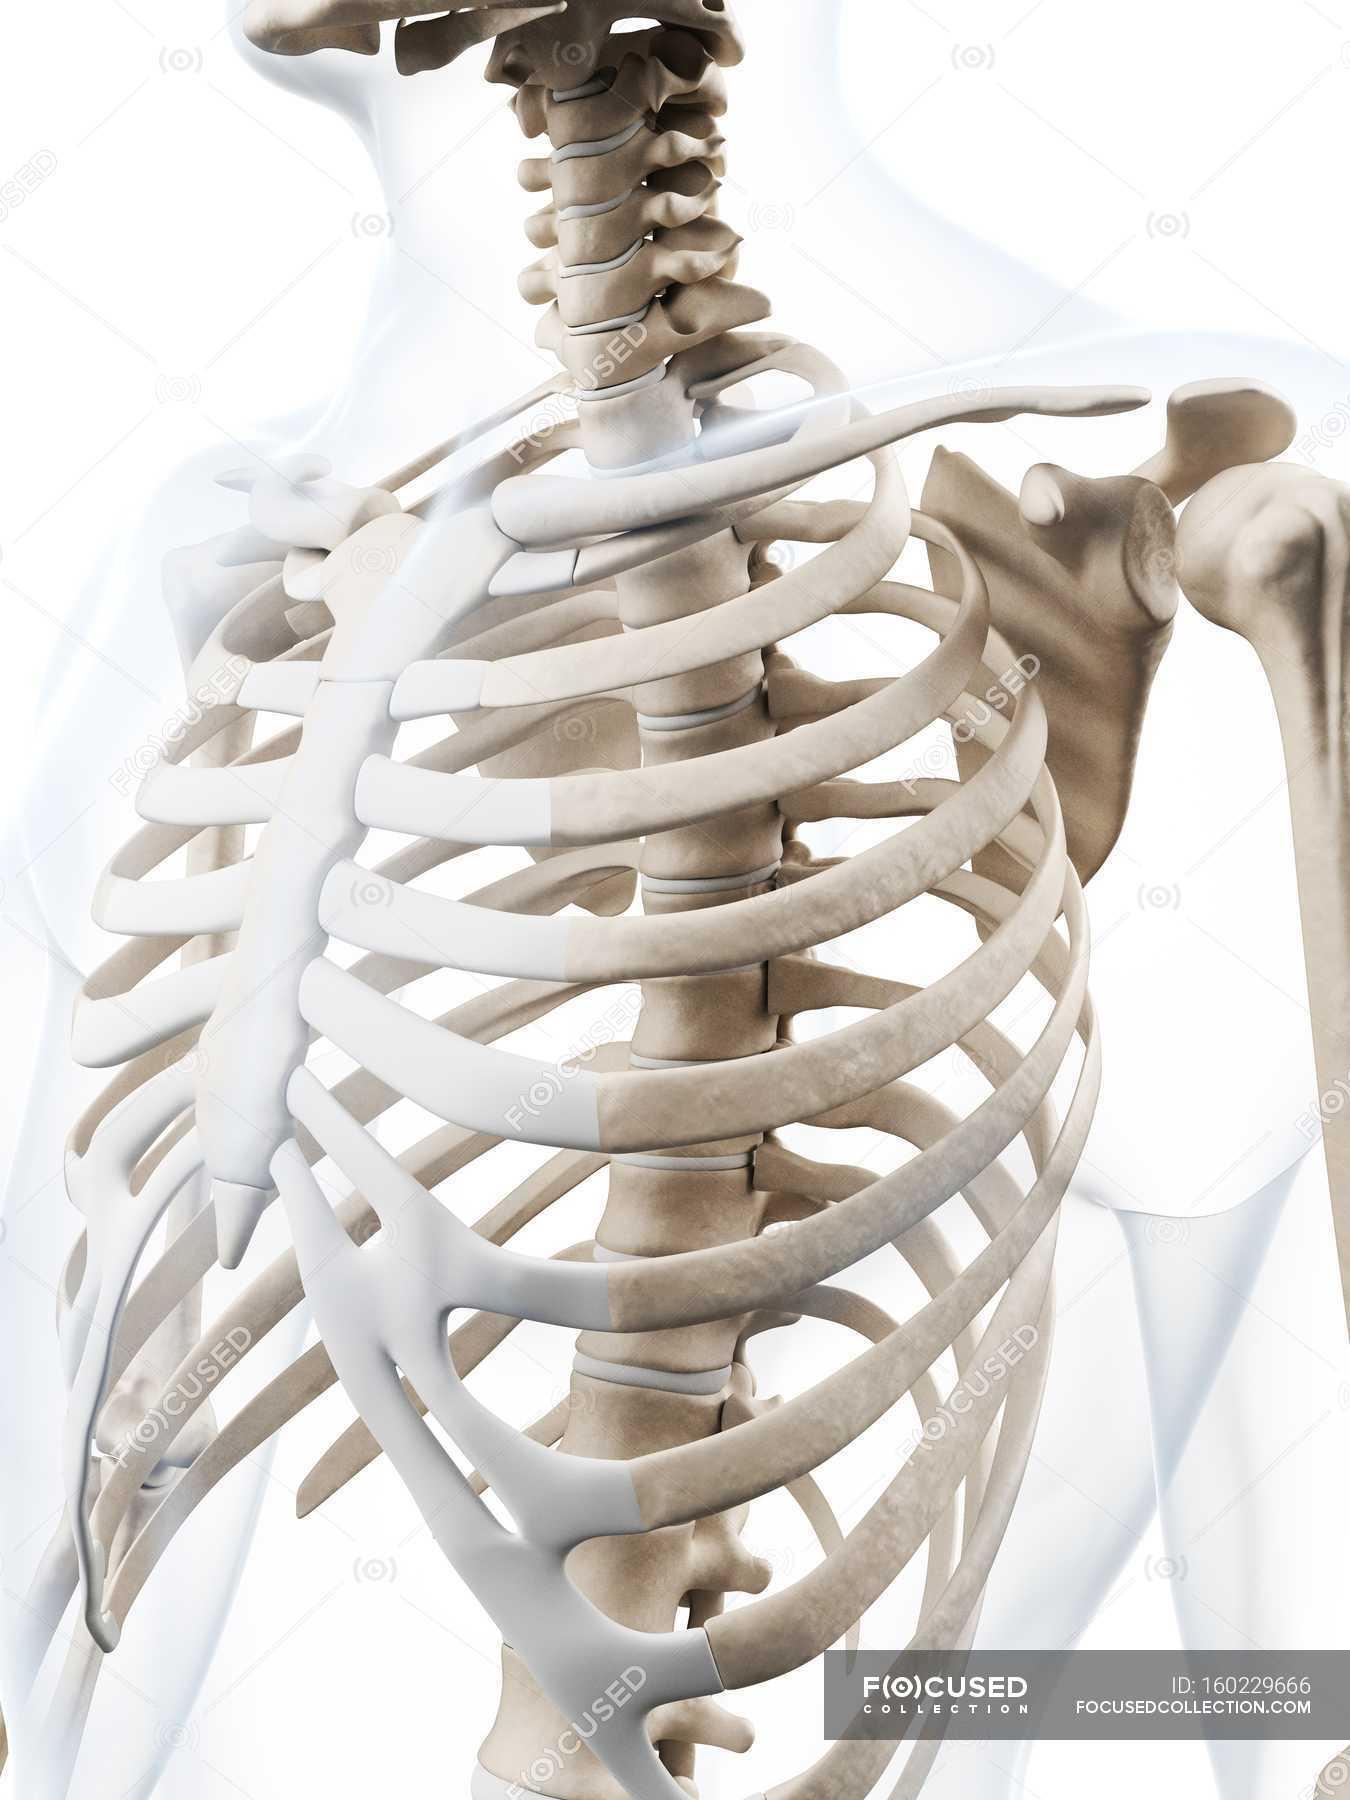 Human rib cage anatomy — Stock Photo | #160229666